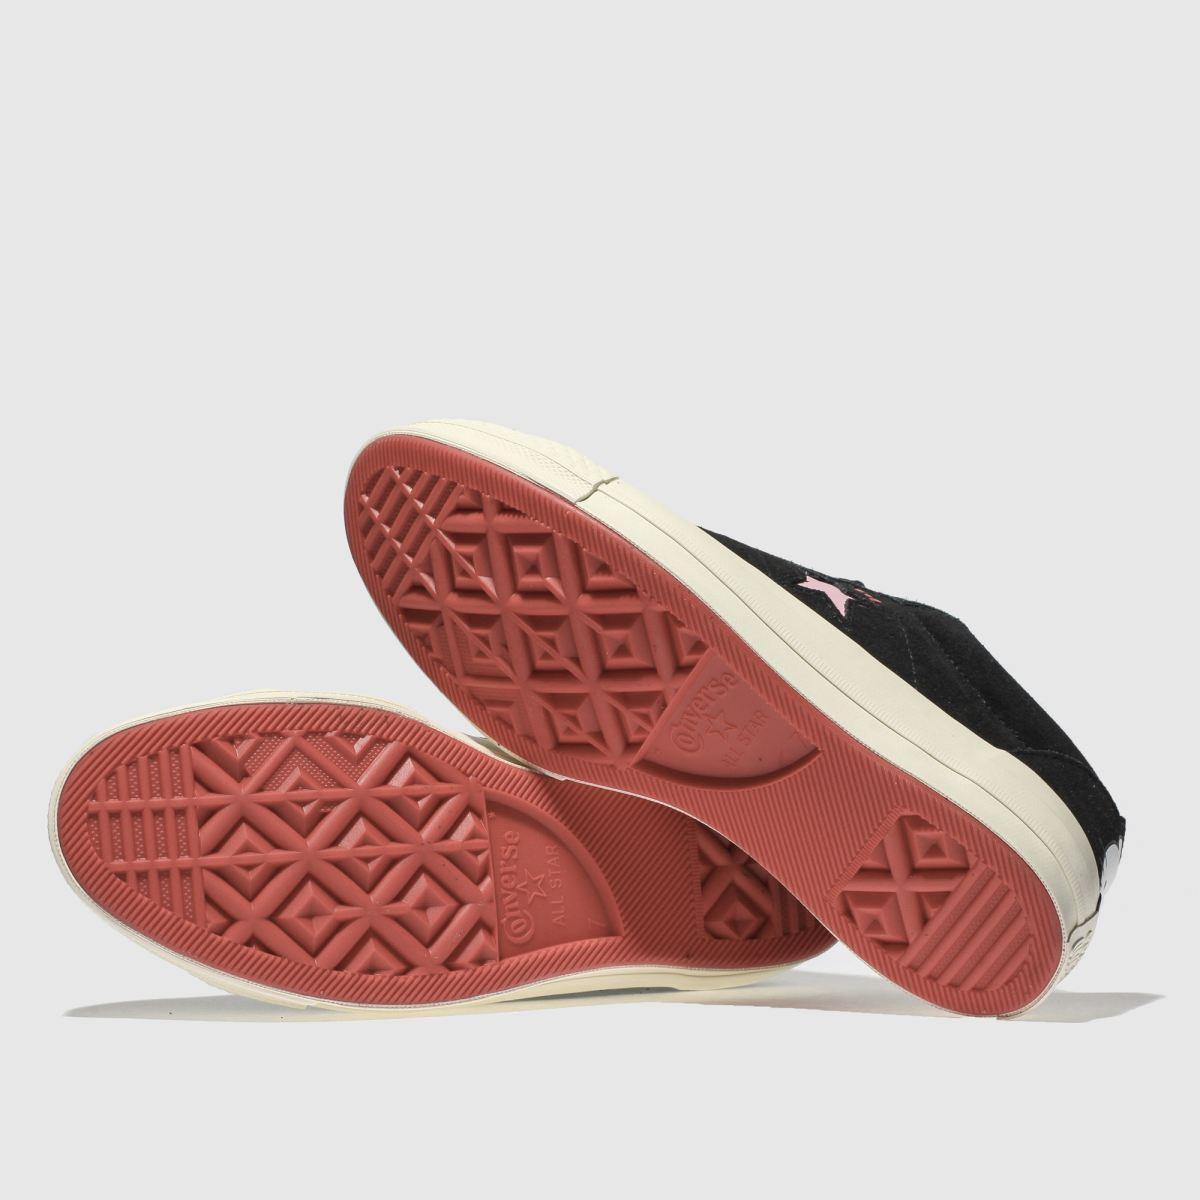 Damen Schwarz converse One Sneaker Star Hello Kitty Suede Sneaker One | schuh Gute Qualität beliebte Schuhe 4a32a8